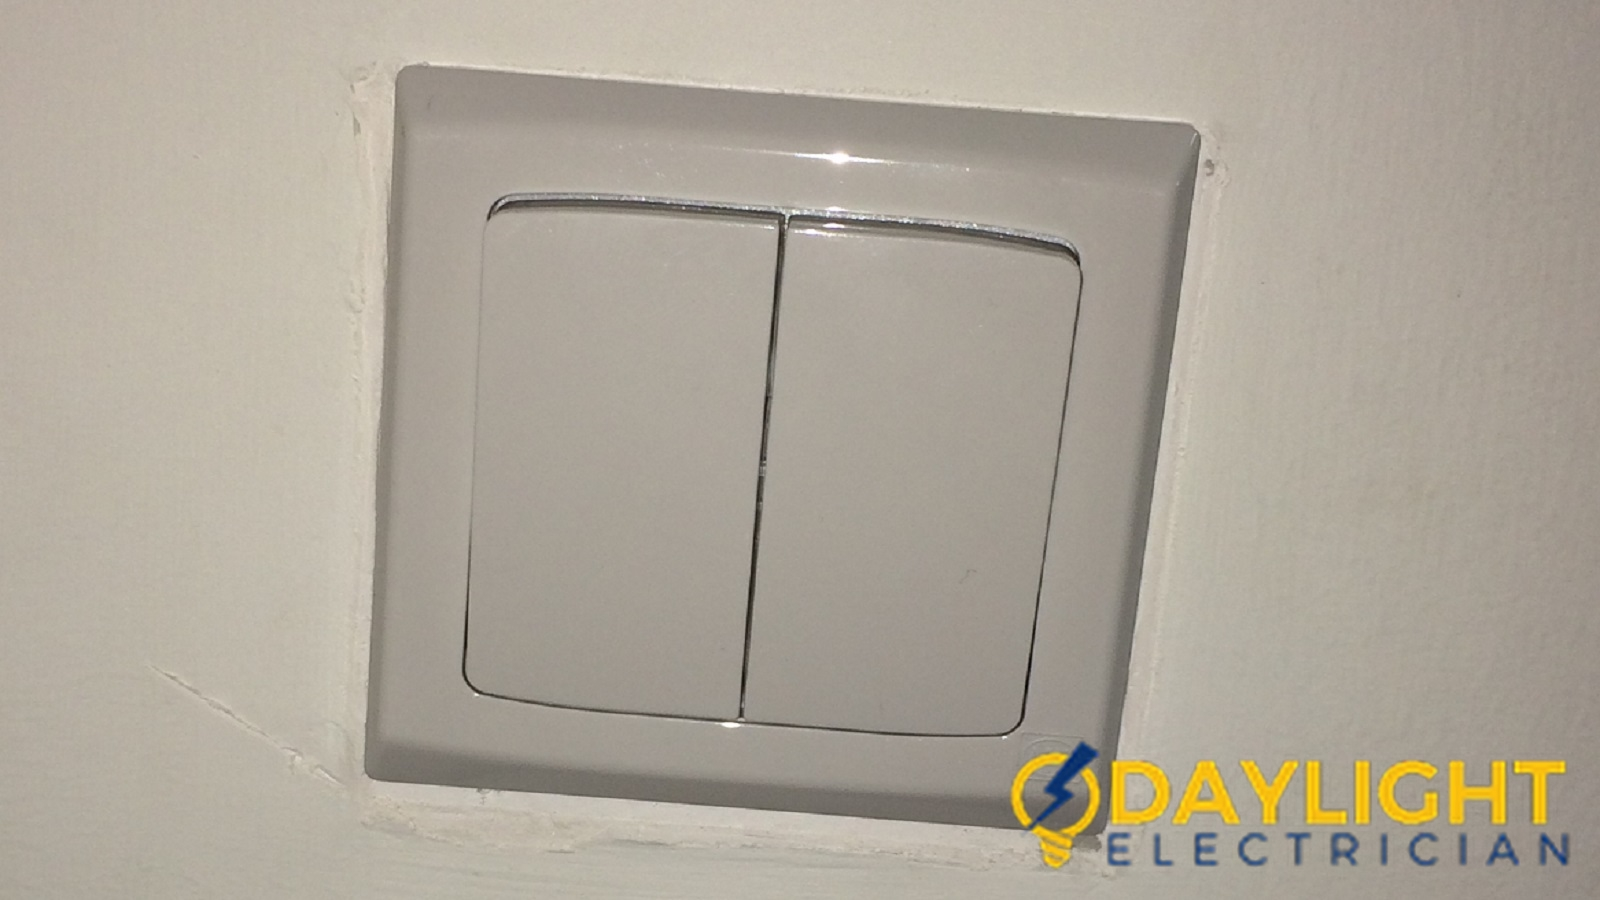 Light-Switch-Repair-Electrician-Singapore-HDB-Woodlands-2_wm